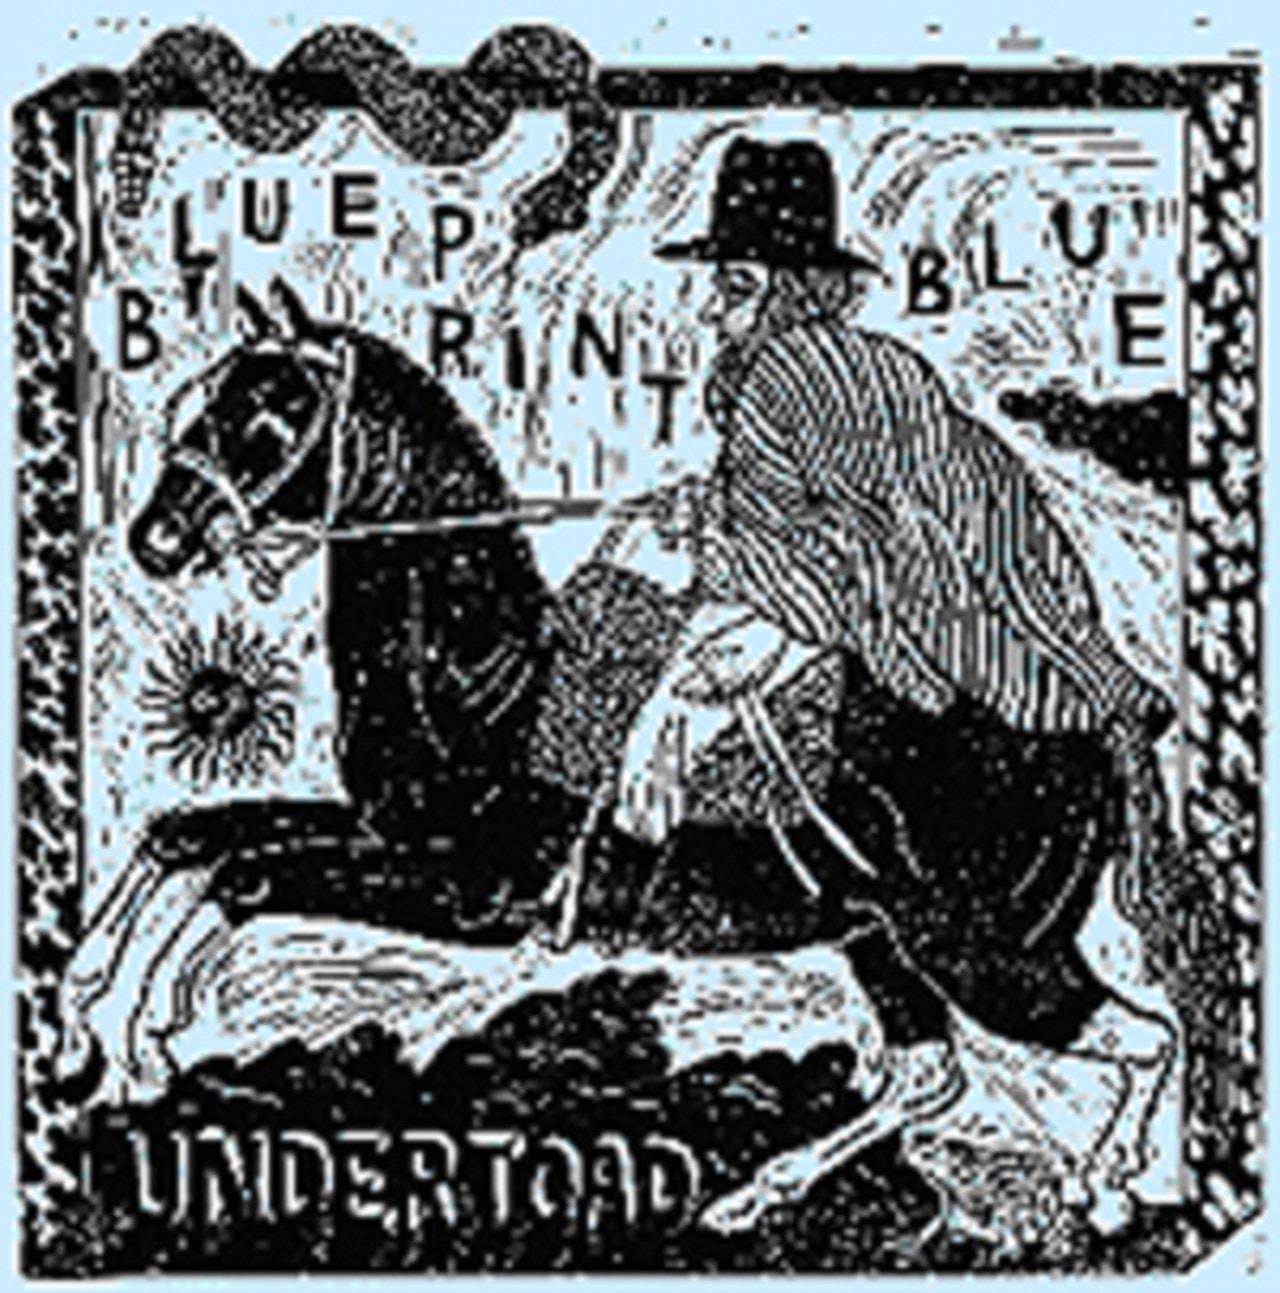 Undertoad - 1